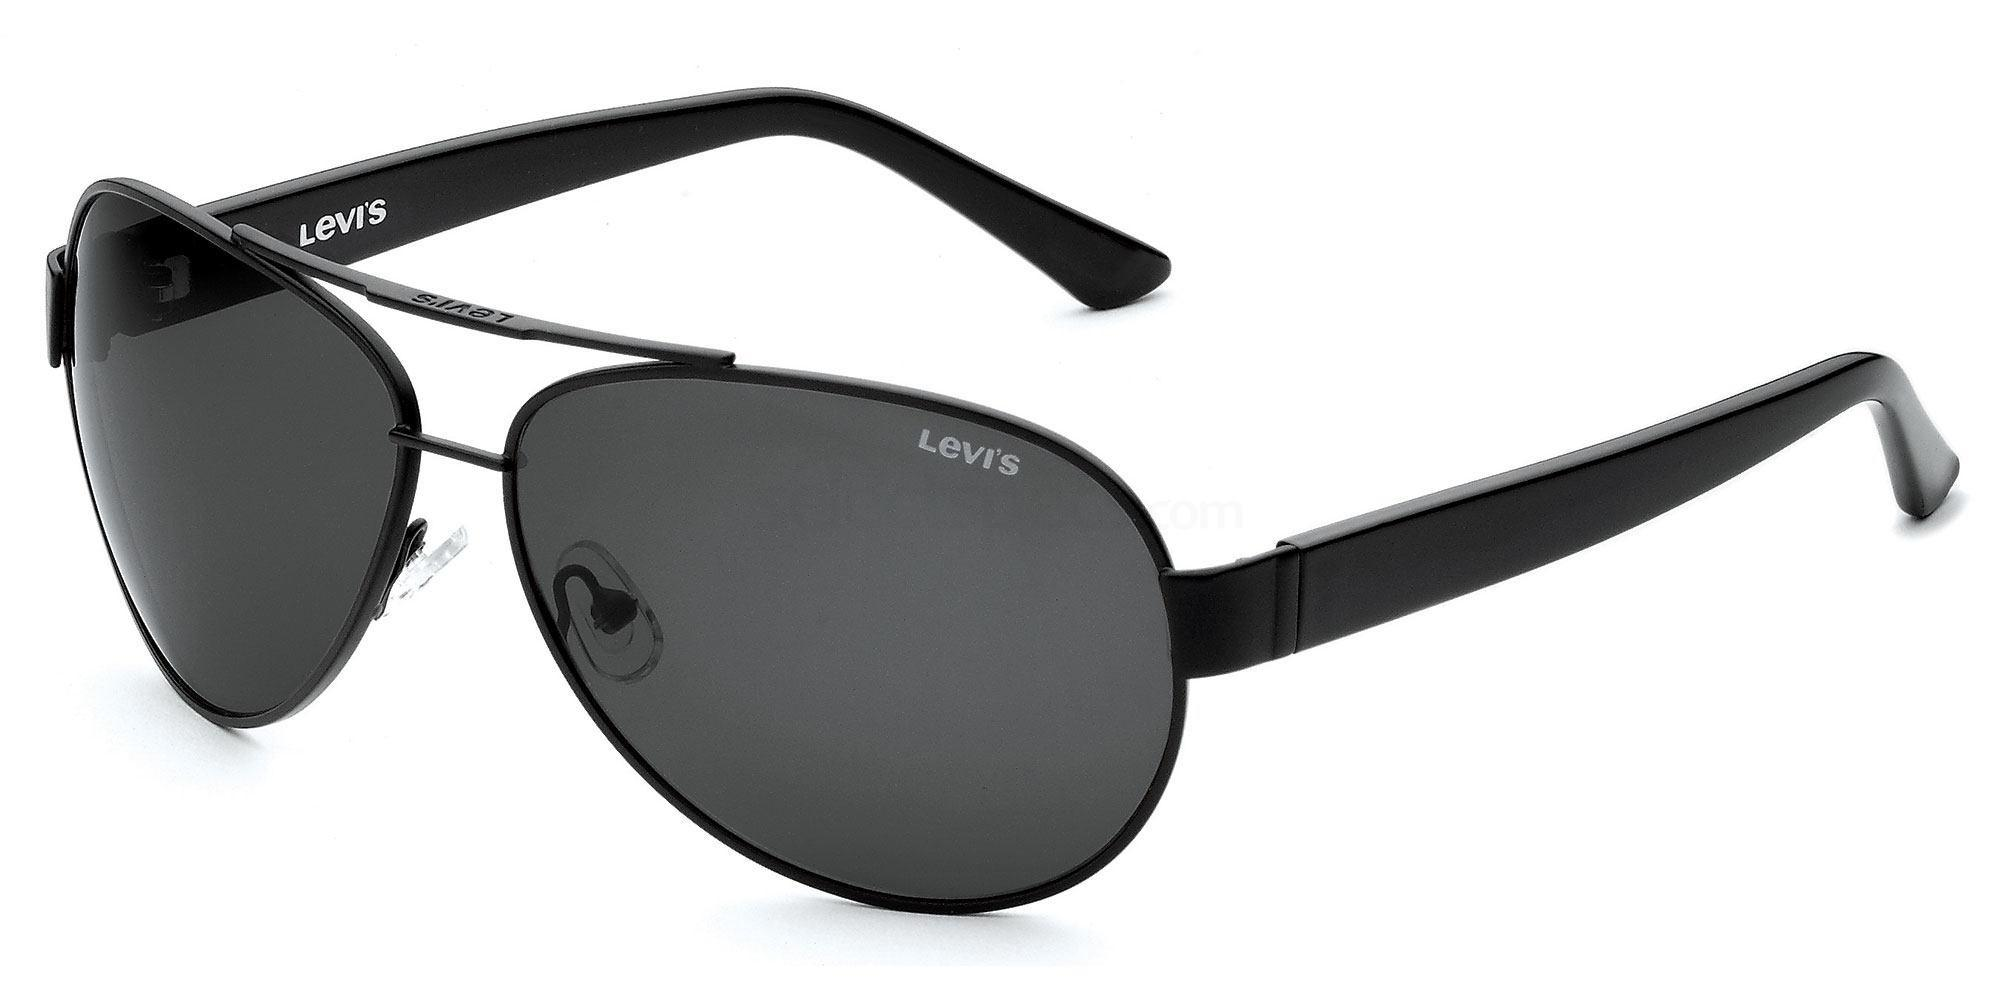 LO22374/01 LO22374 Sunglasses, Levi's Eyewear